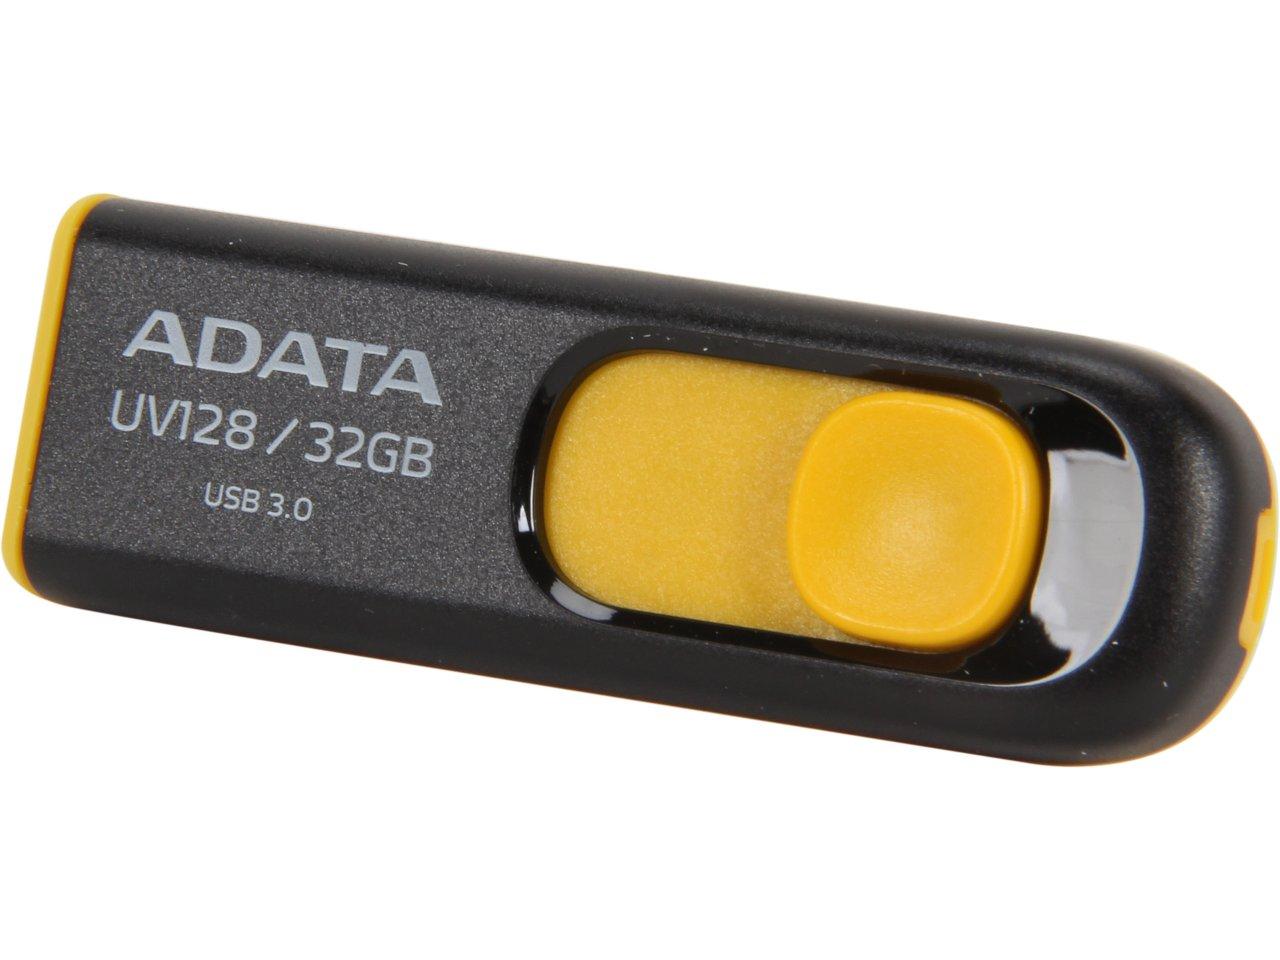 32 GB ADATA DashDrive UV128 USB 3.0 Flash Drive for $6.99 AC or 64 GB HP x755w USB 3.0 Flash Drive for $12.99 + S&H @ Newegg.com